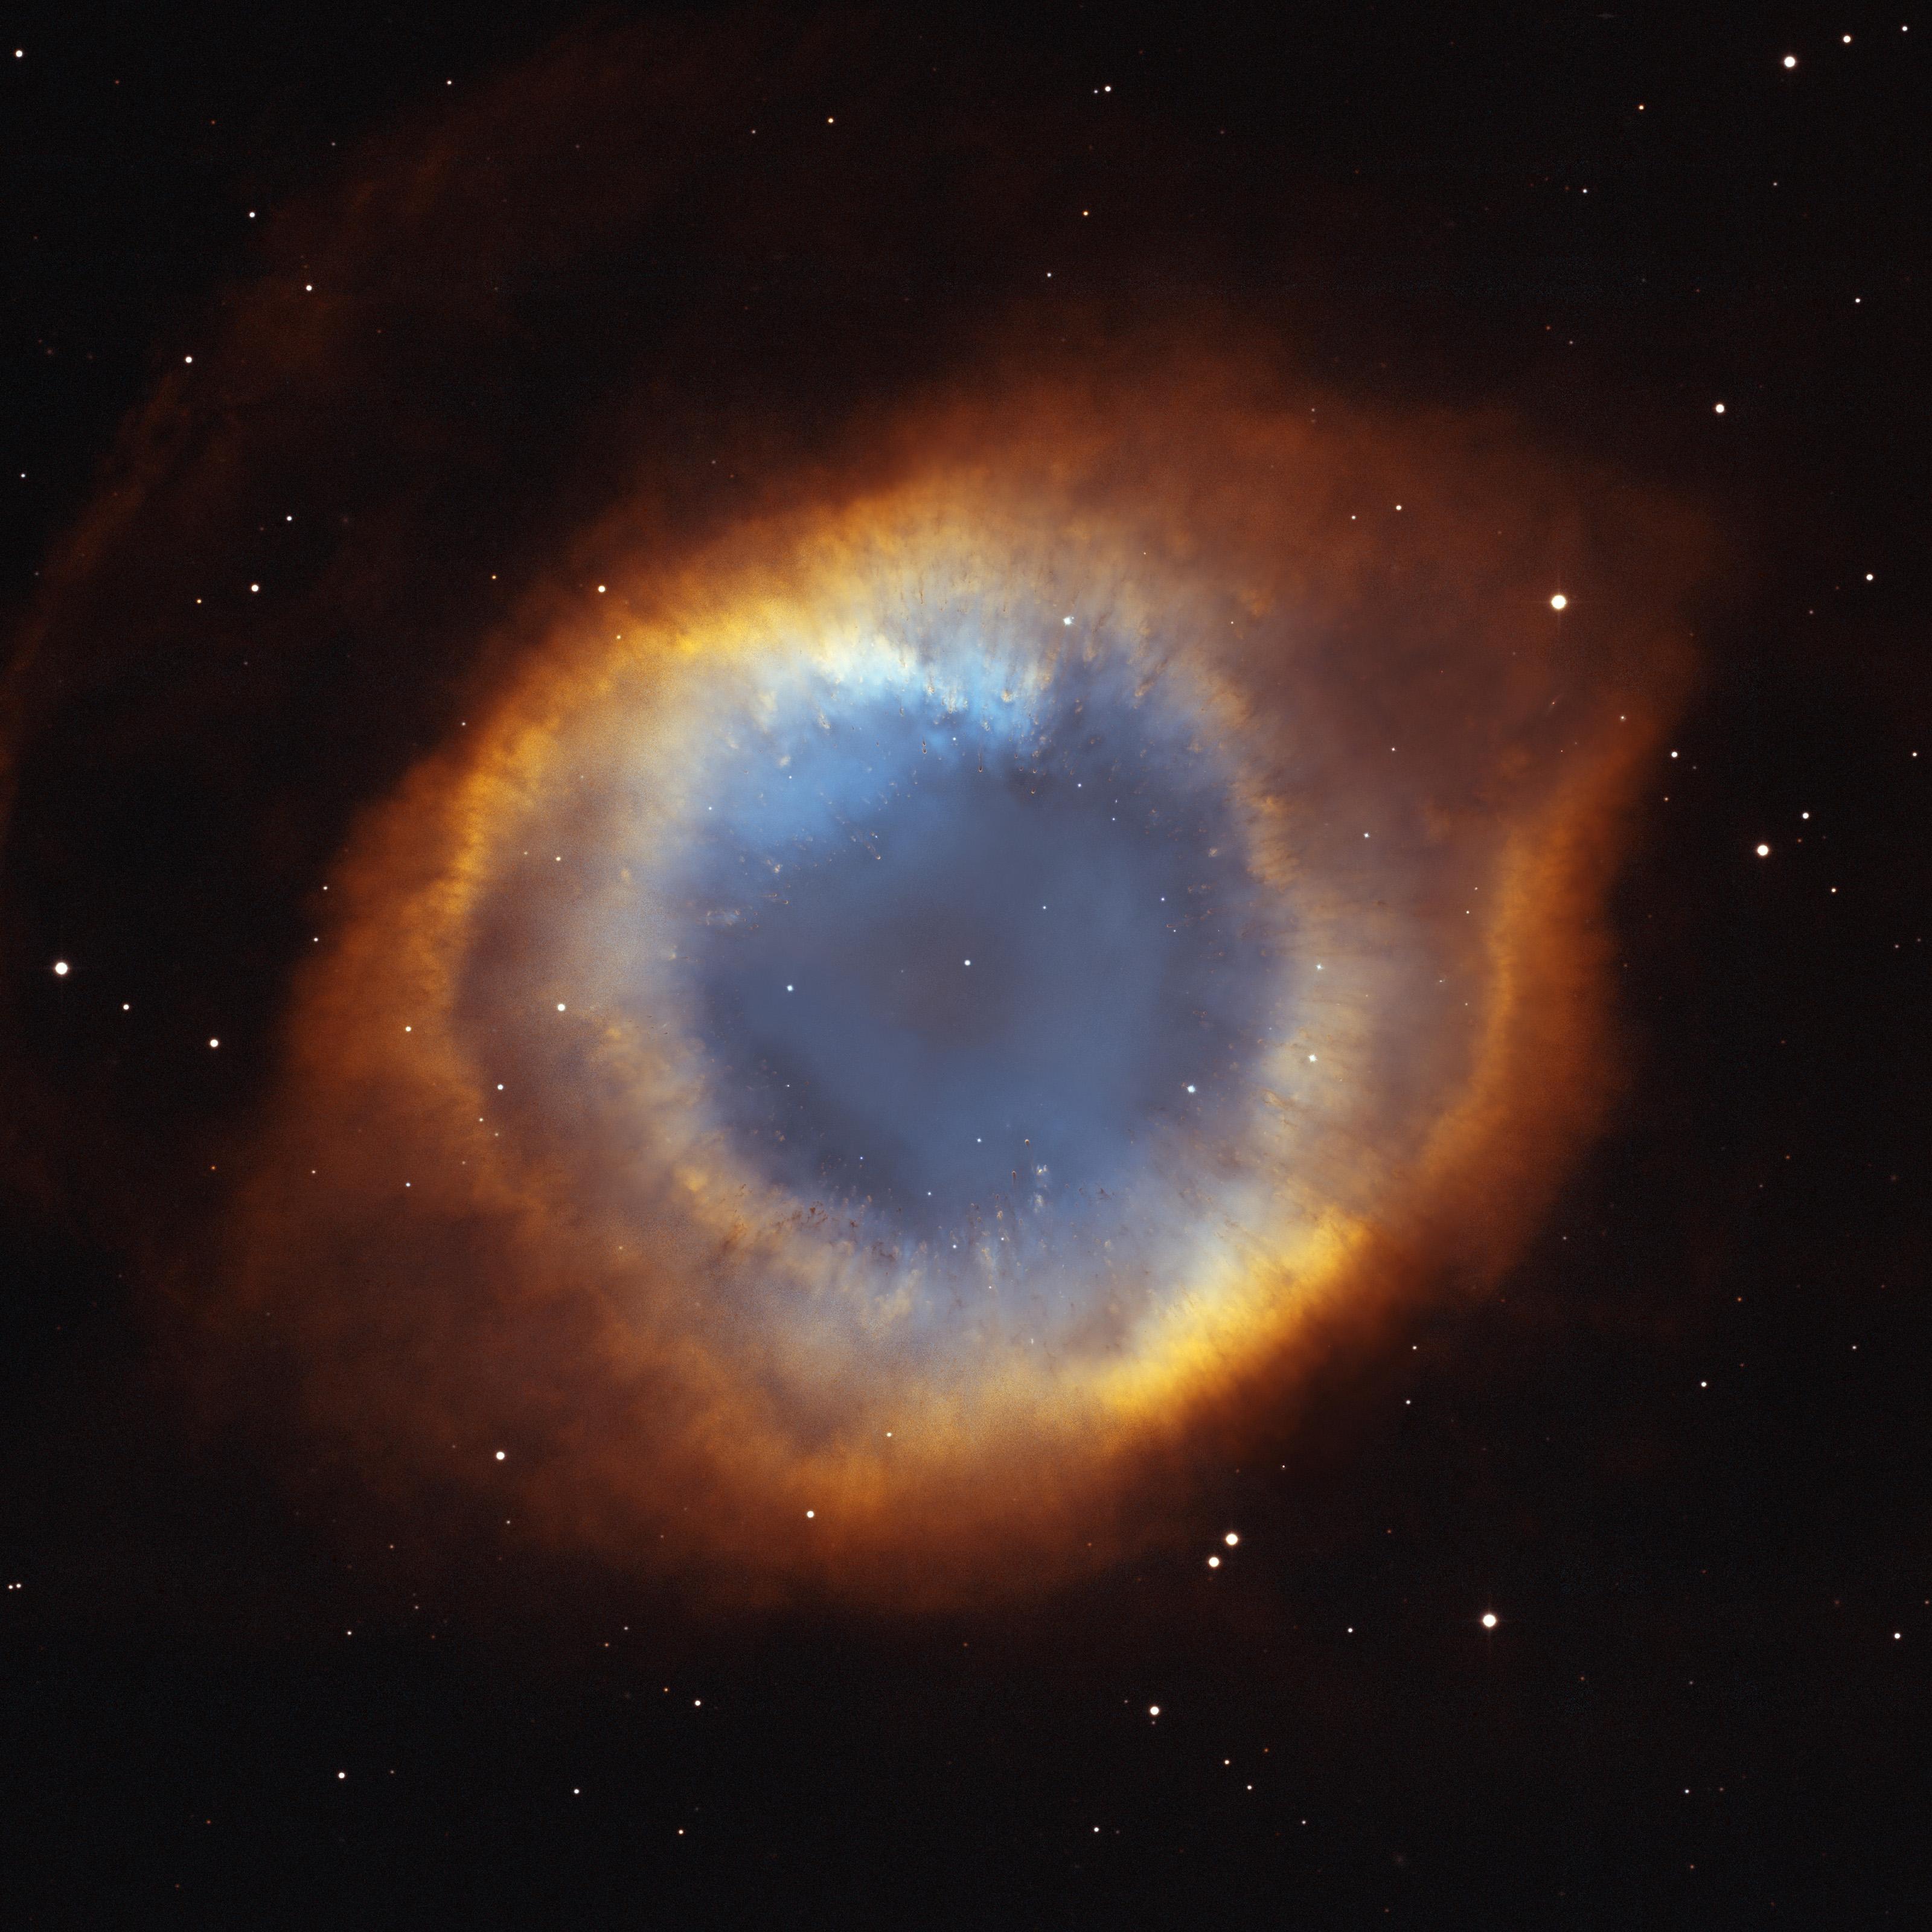 helix nebula constellation aquarius - photo #19